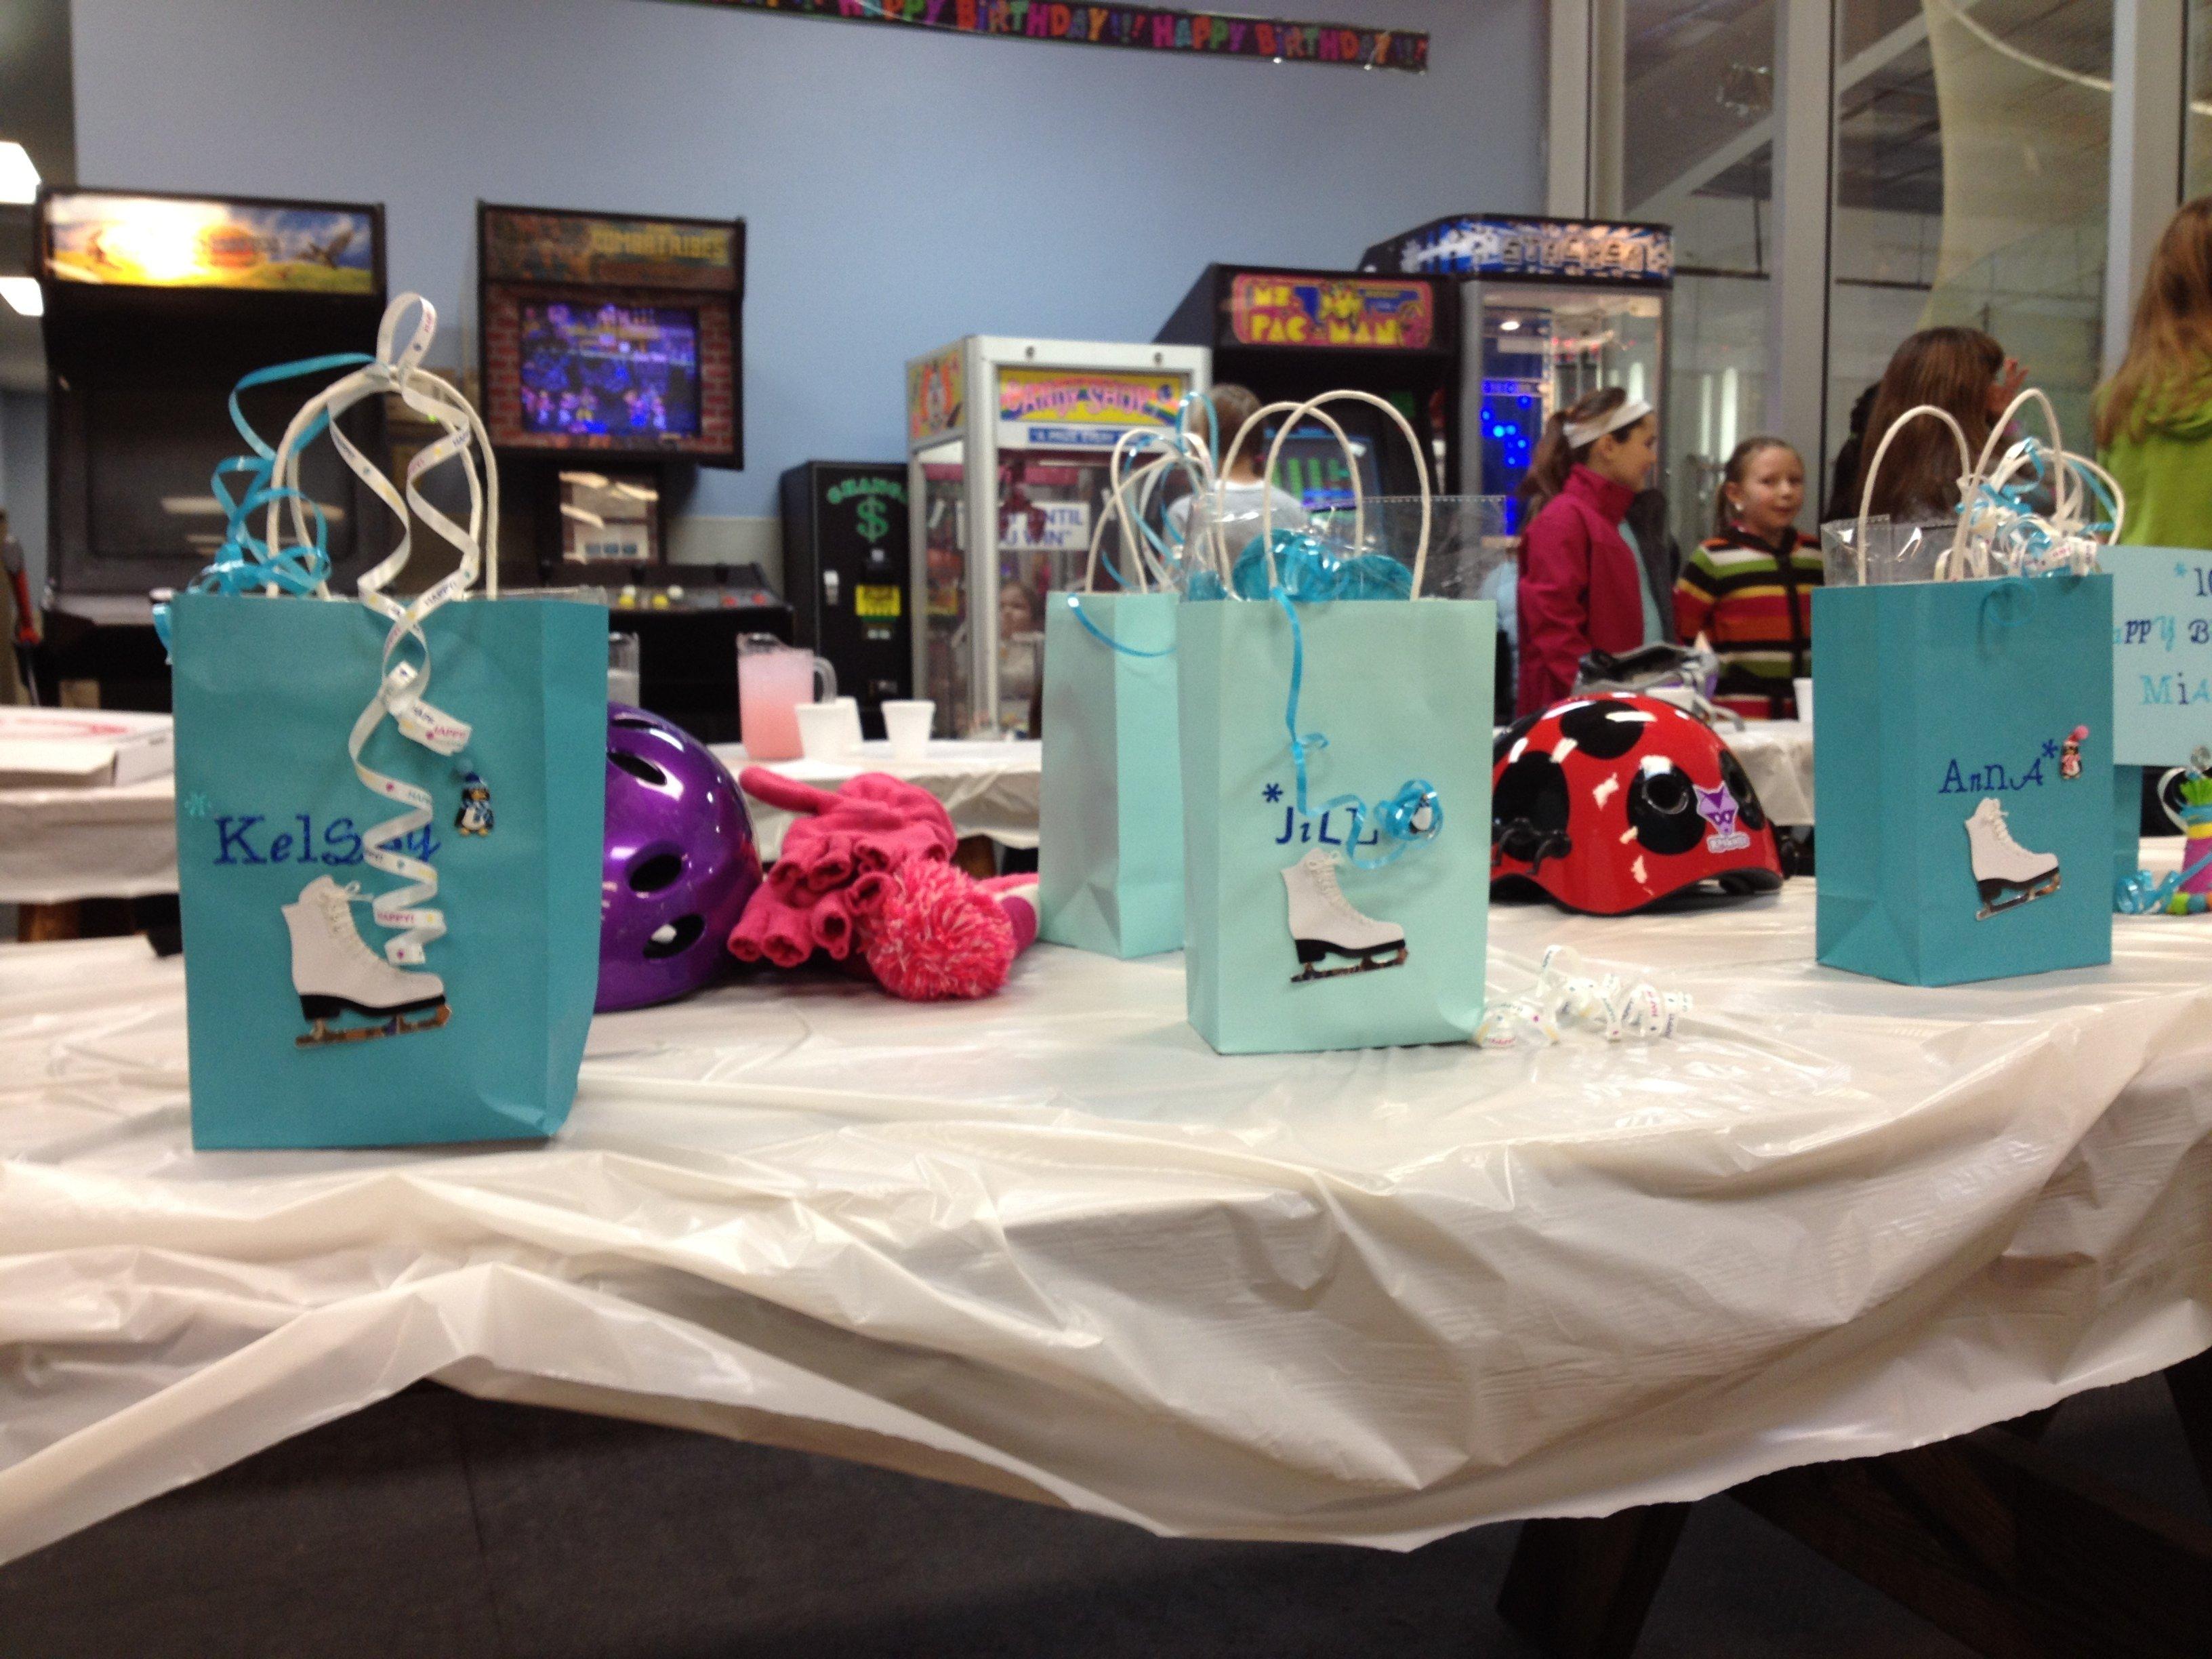 10 Fashionable Ice Skating Birthday Party Ideas birthday parties newington arena